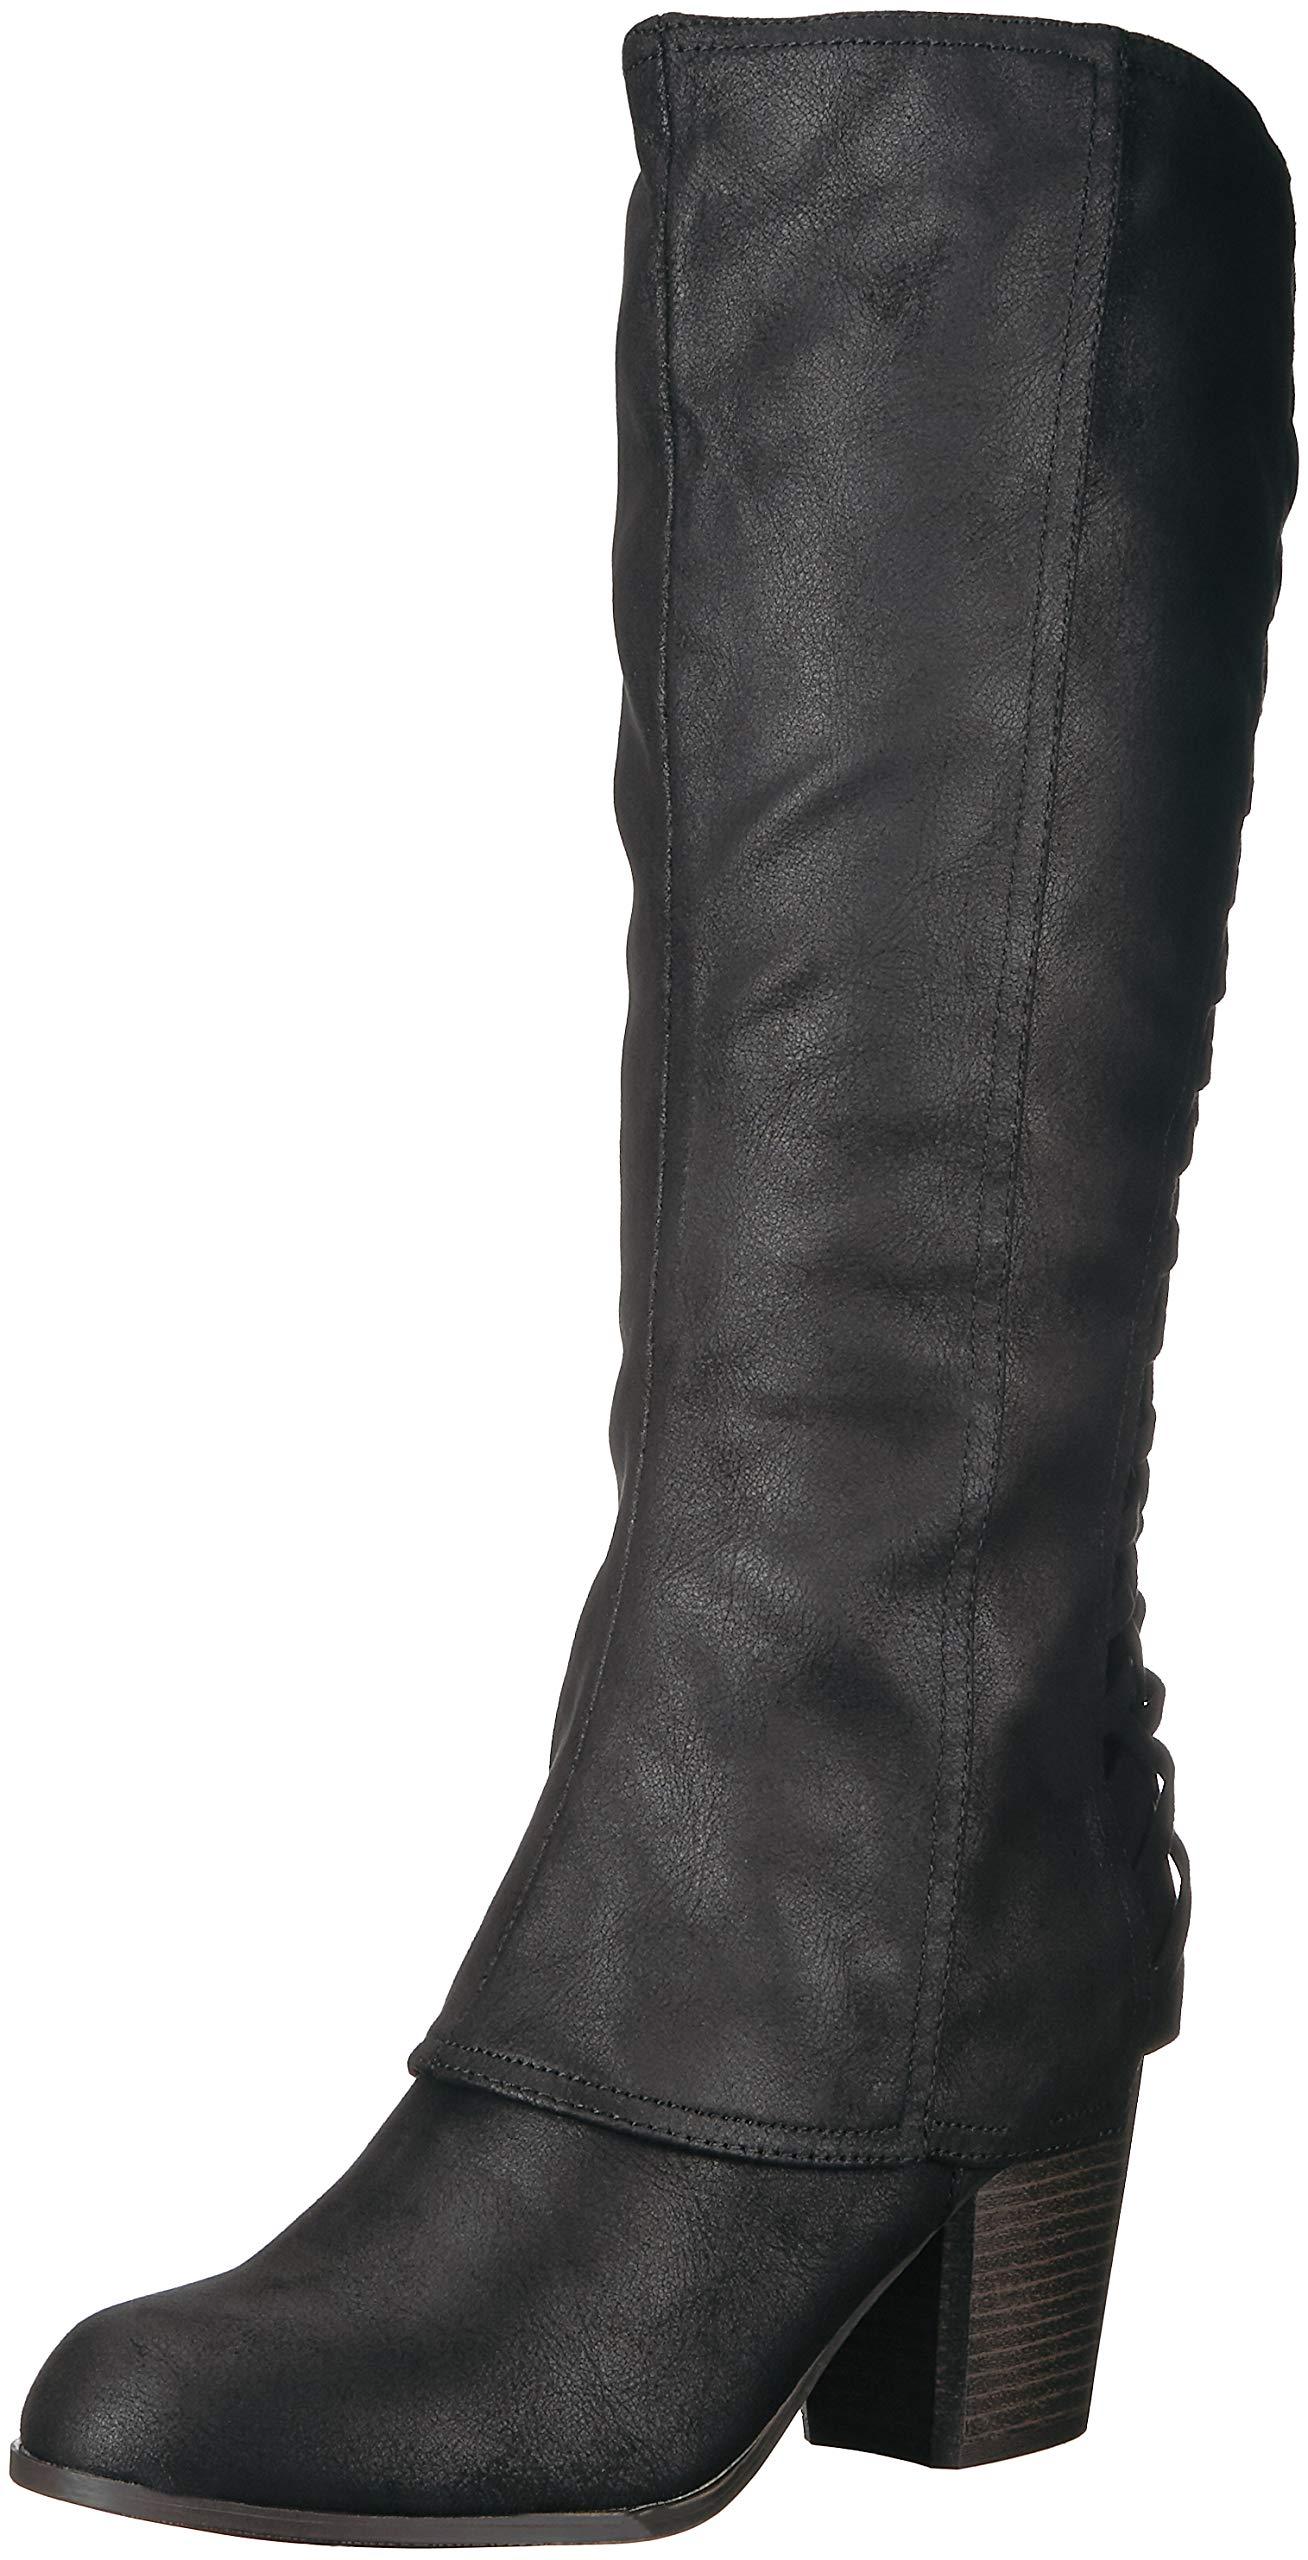 Fergalicious Women's Tootsie Knee High Boot, Black, 10 M US